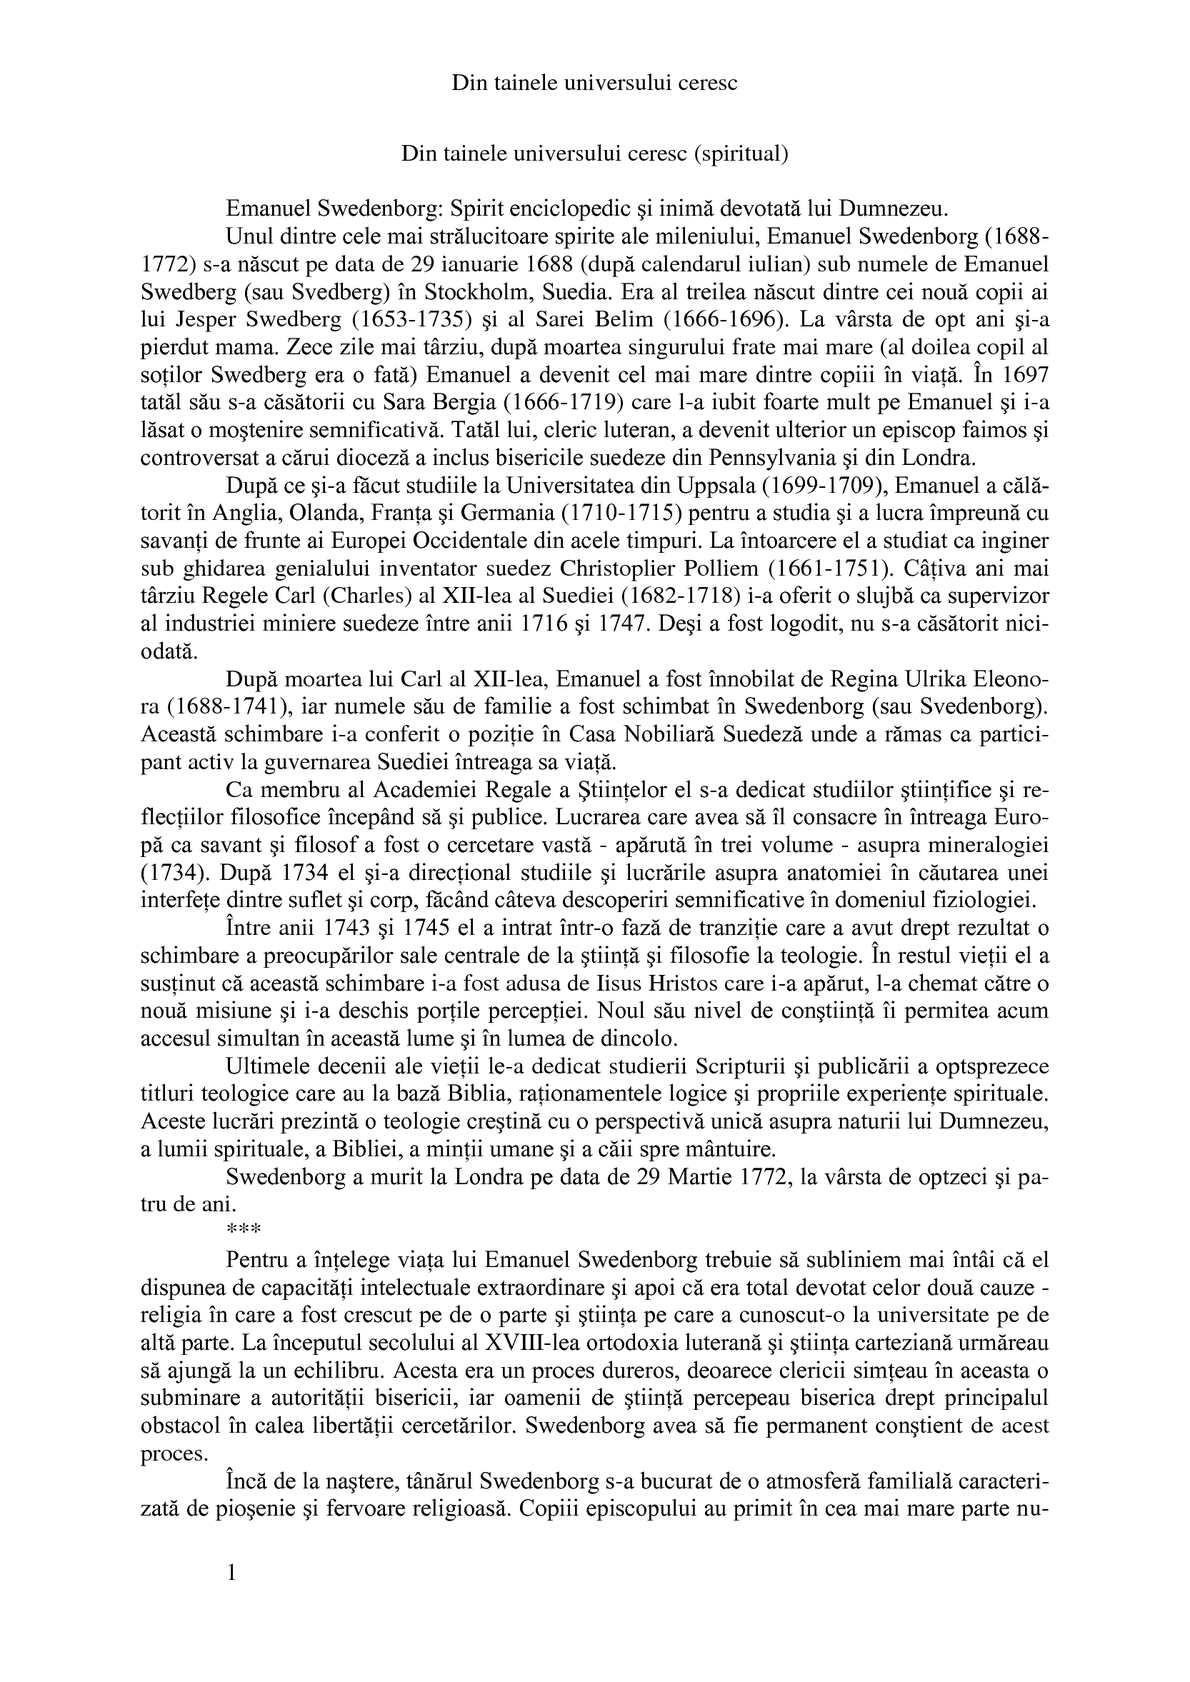 Liutprand al longobarzilor - Wikipedia